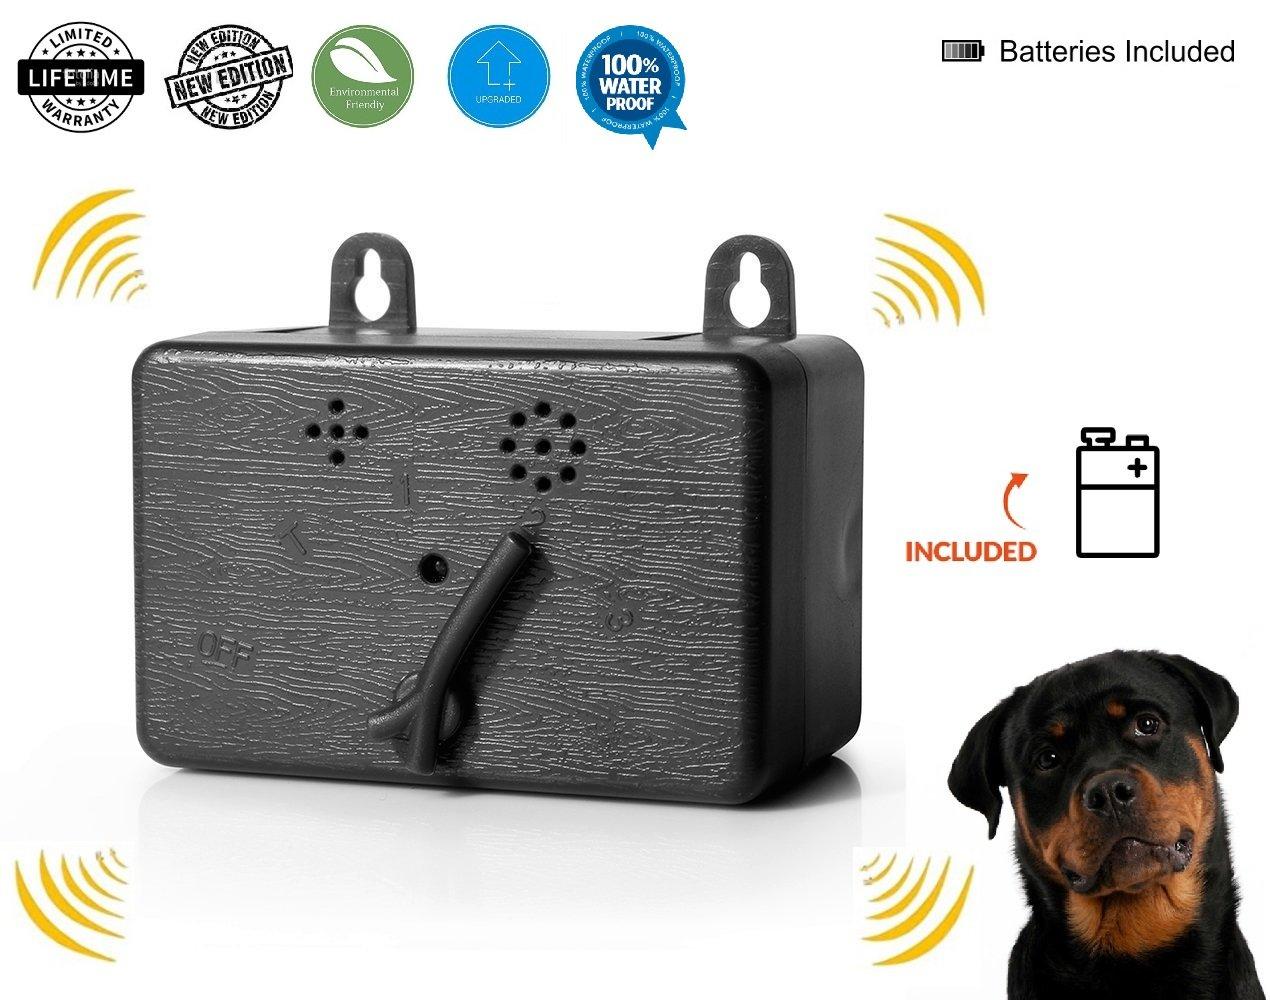 Access & Gadgets Brand New Mini Bark Control Device Outdoor Anti Barking Ultrasonic Dog Bark Control Sonic Bark Deterrents Silencer Stop Barking Bark Stop Repeller Battery Included